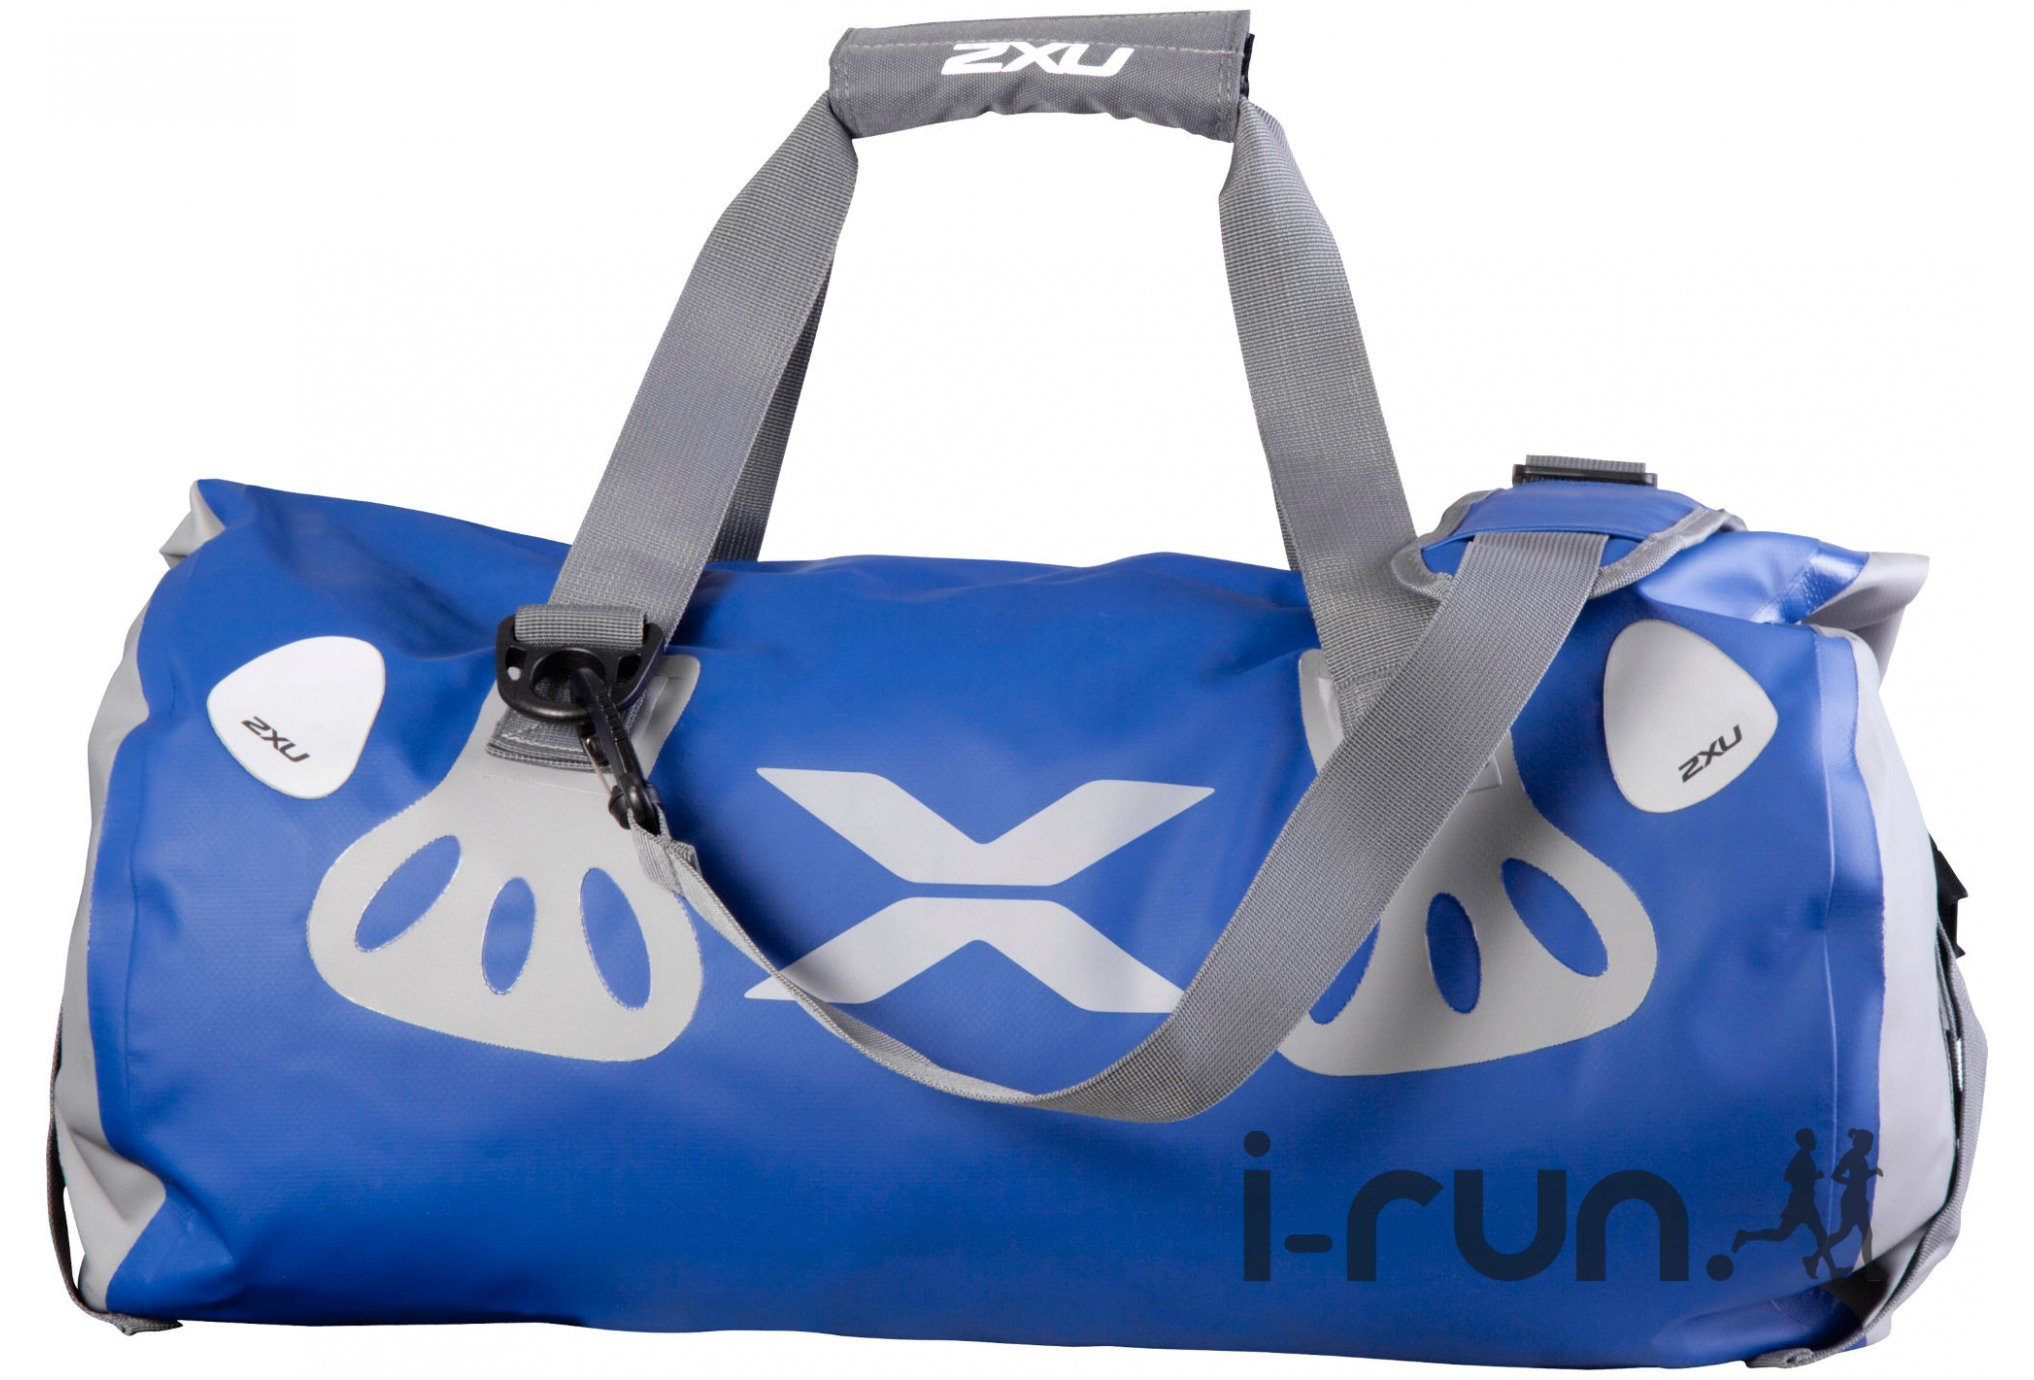 2XU Sac de sport Seamless Waterproof Sac de sport